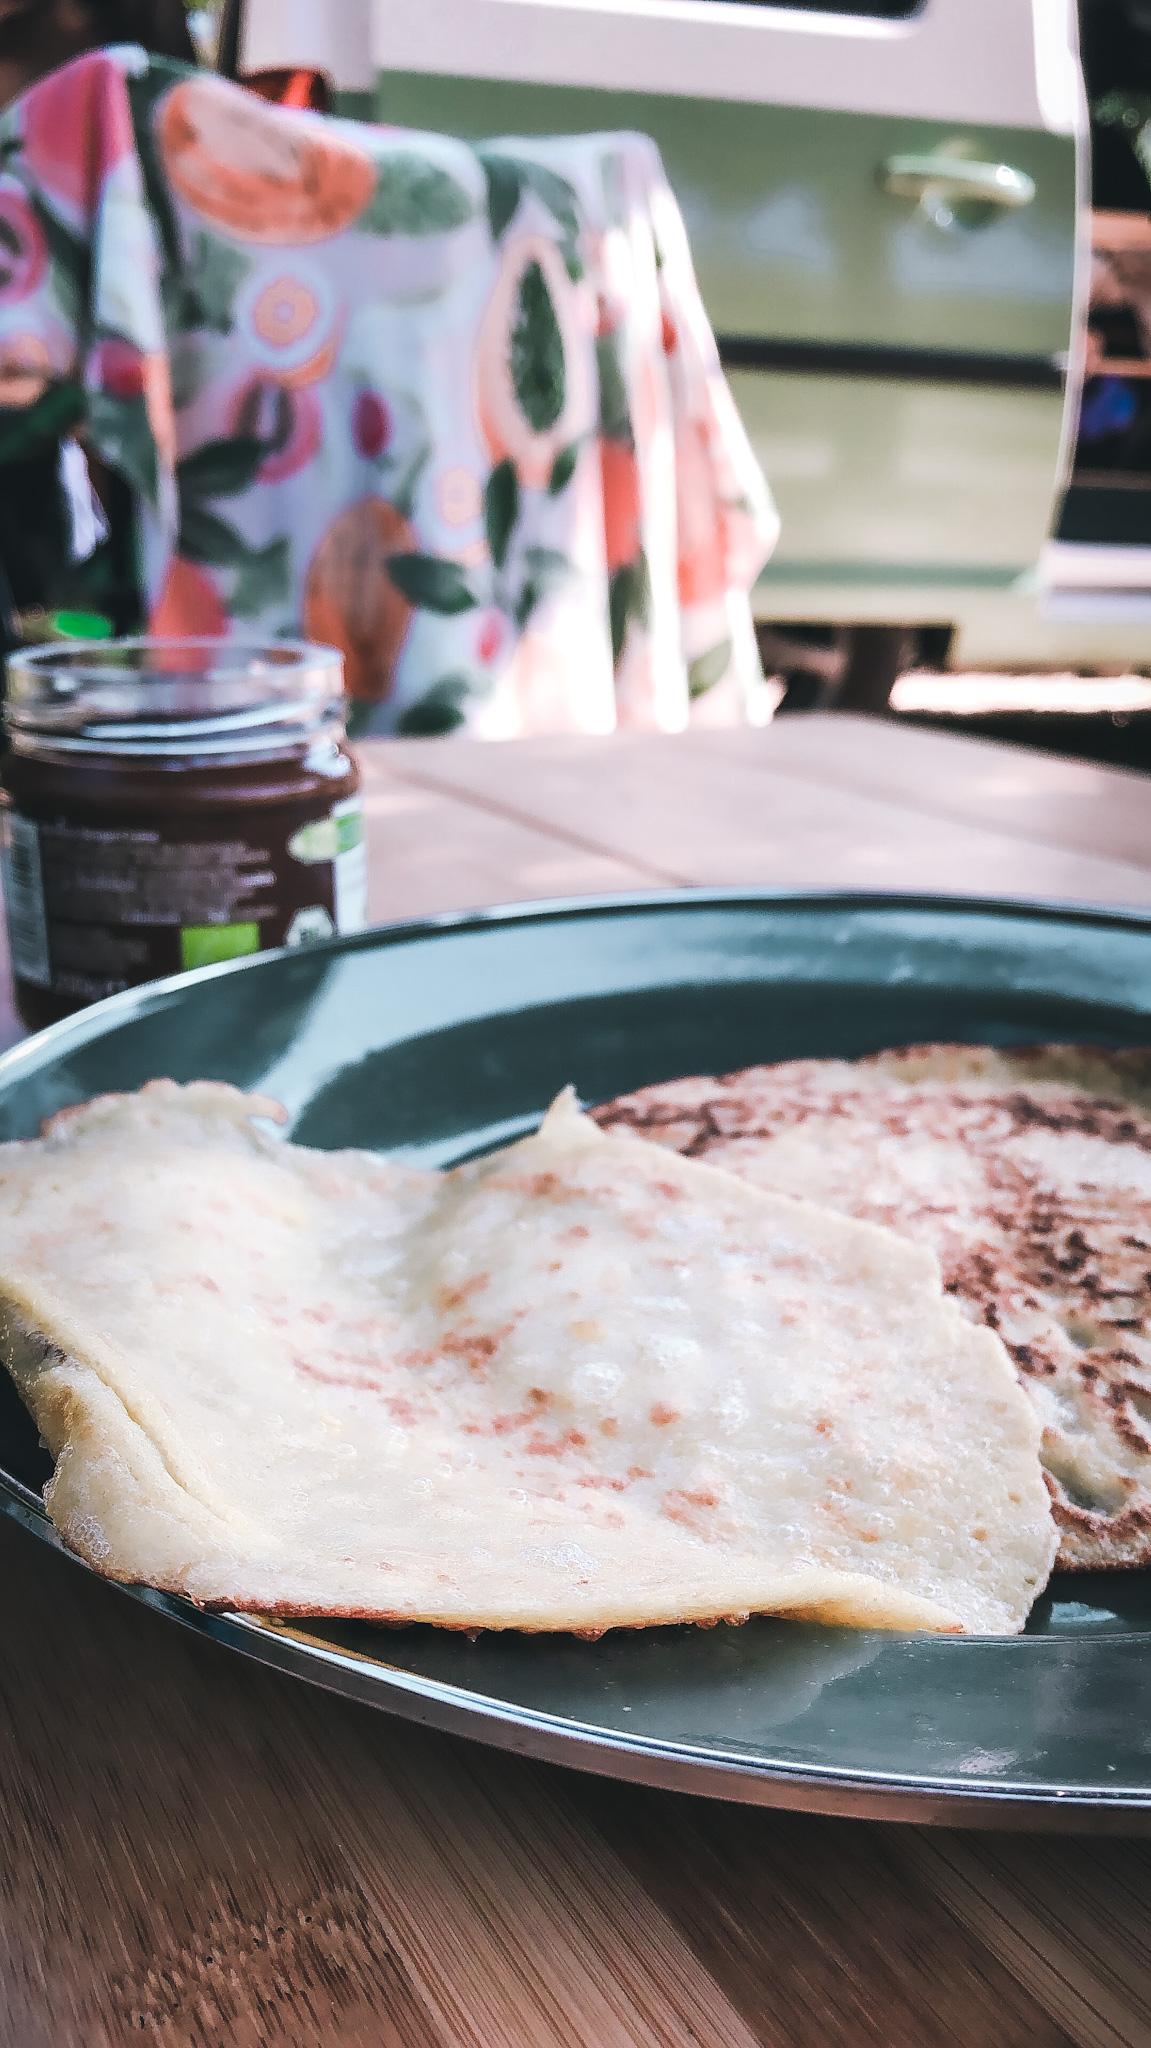 Pancakes and vanlife on Lefkada